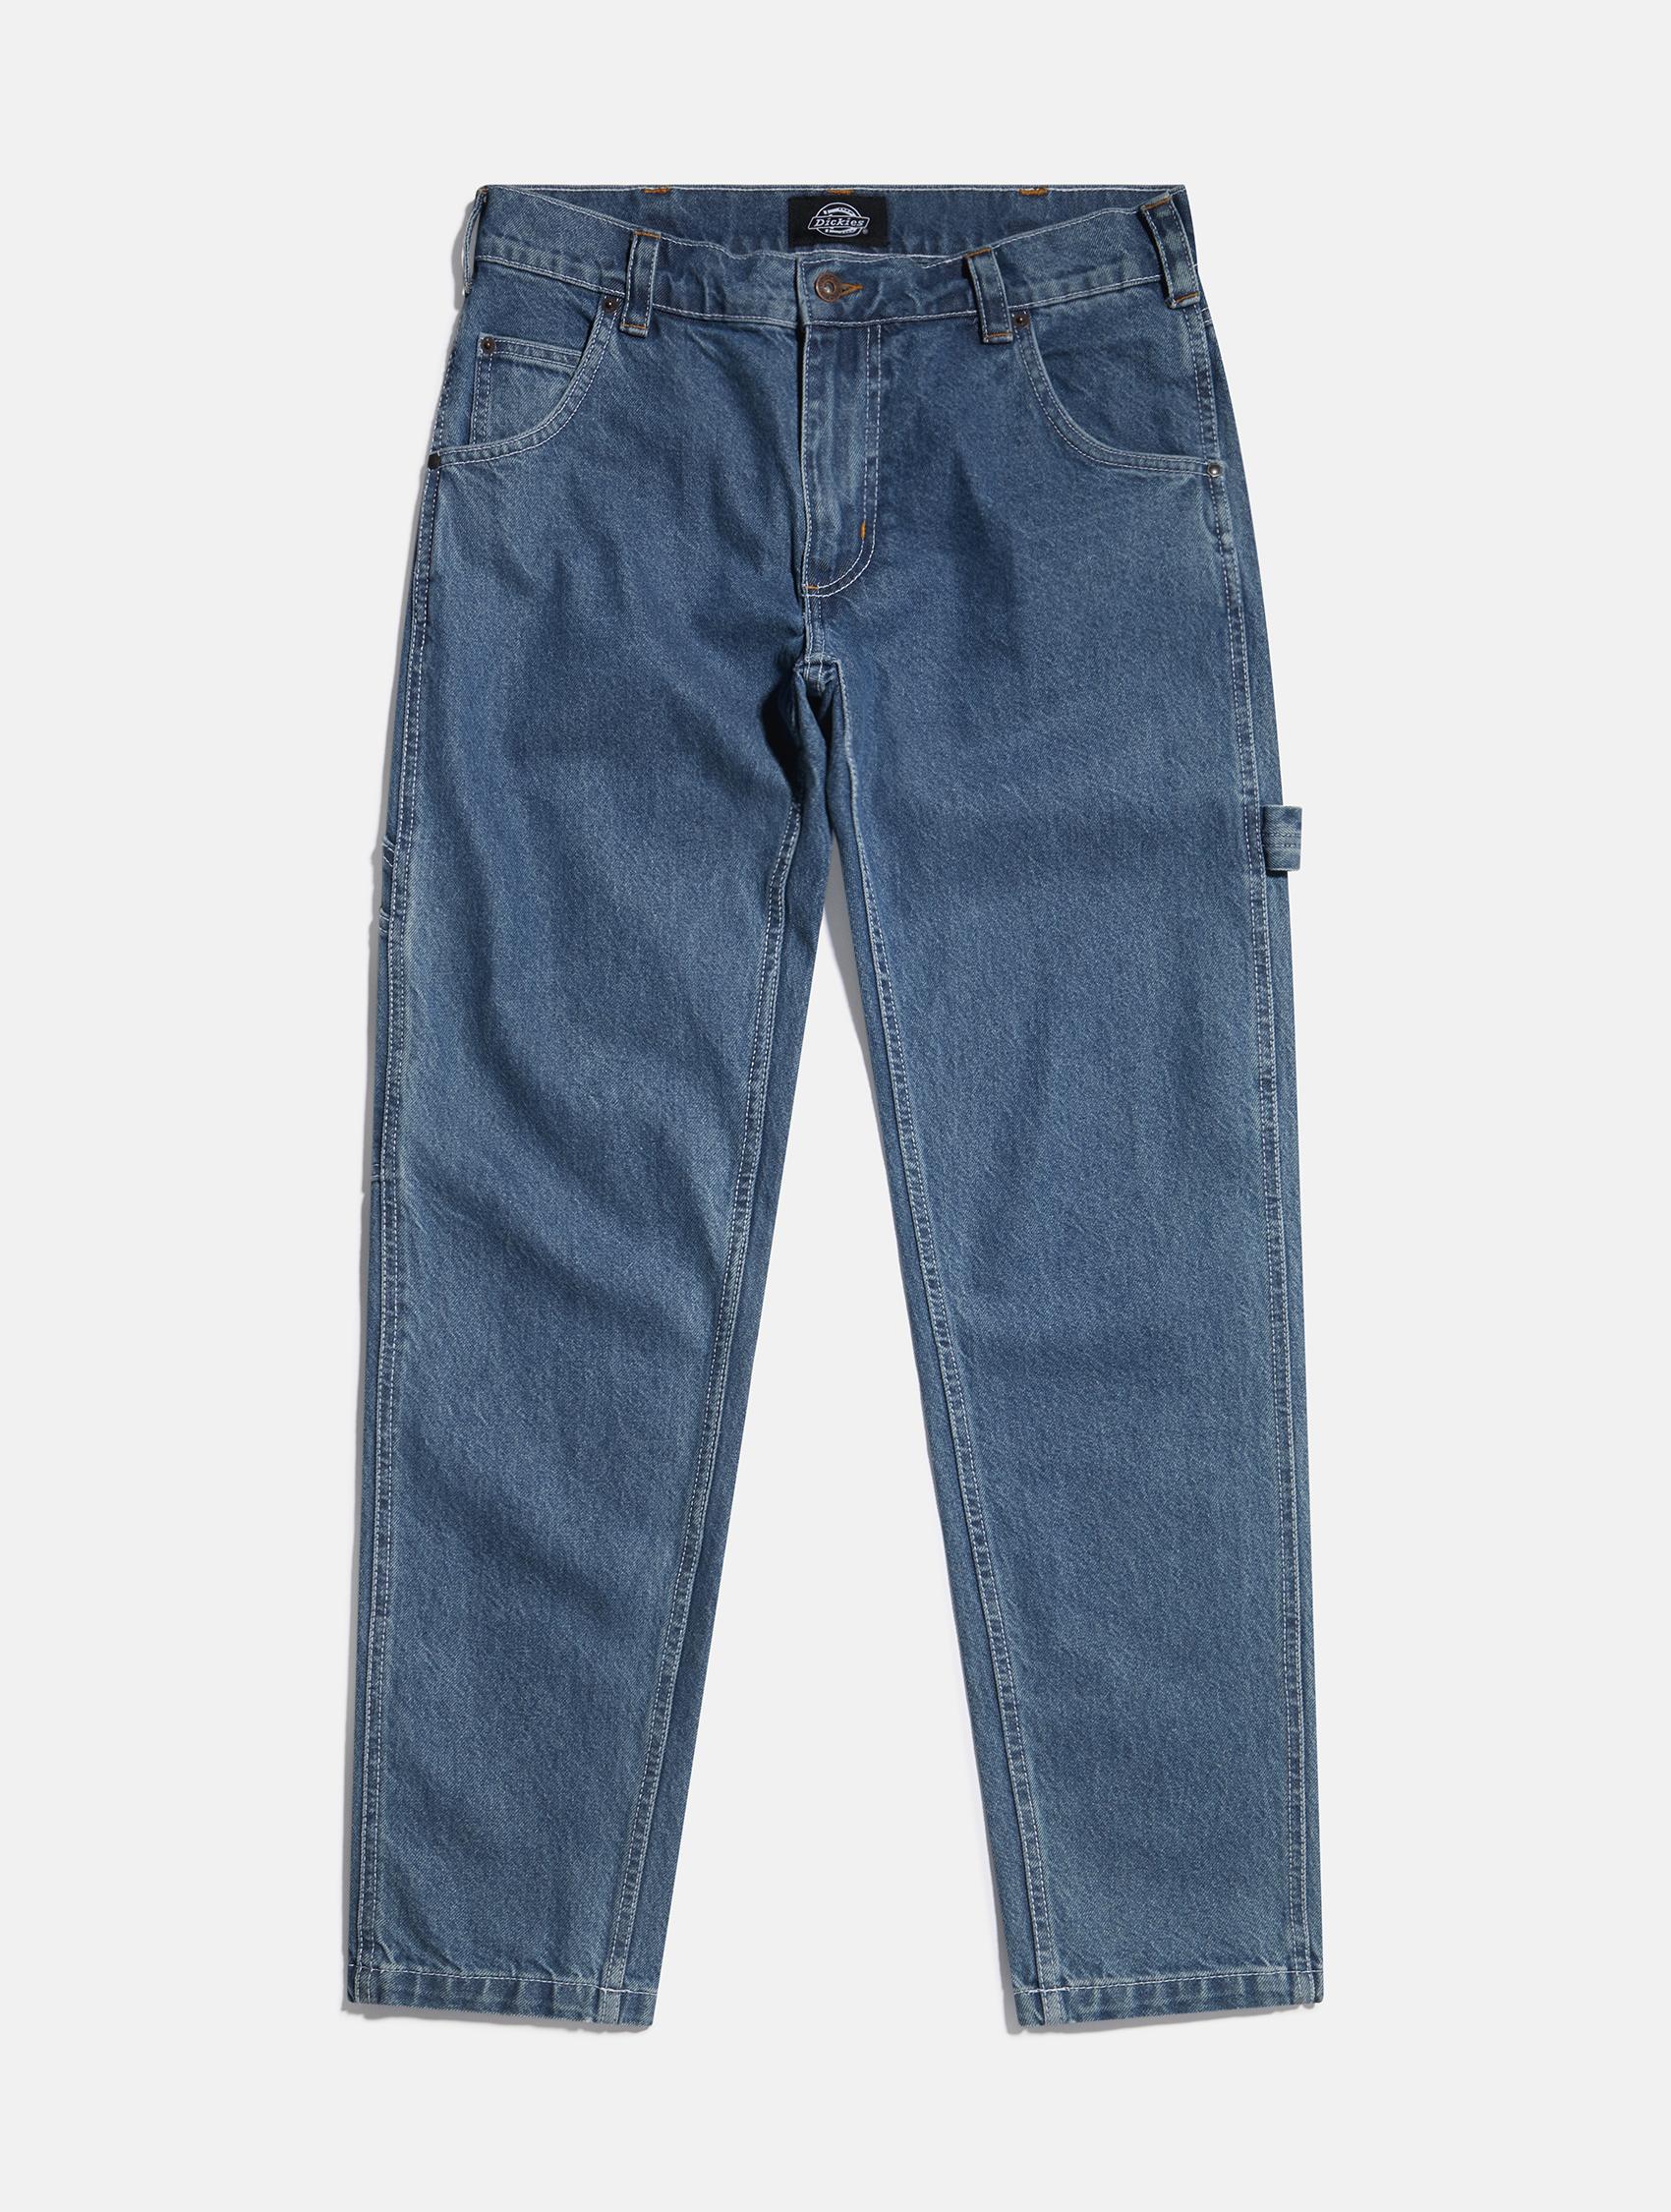 Dickies blue denim jeans   eCommerce Photography London   LRP